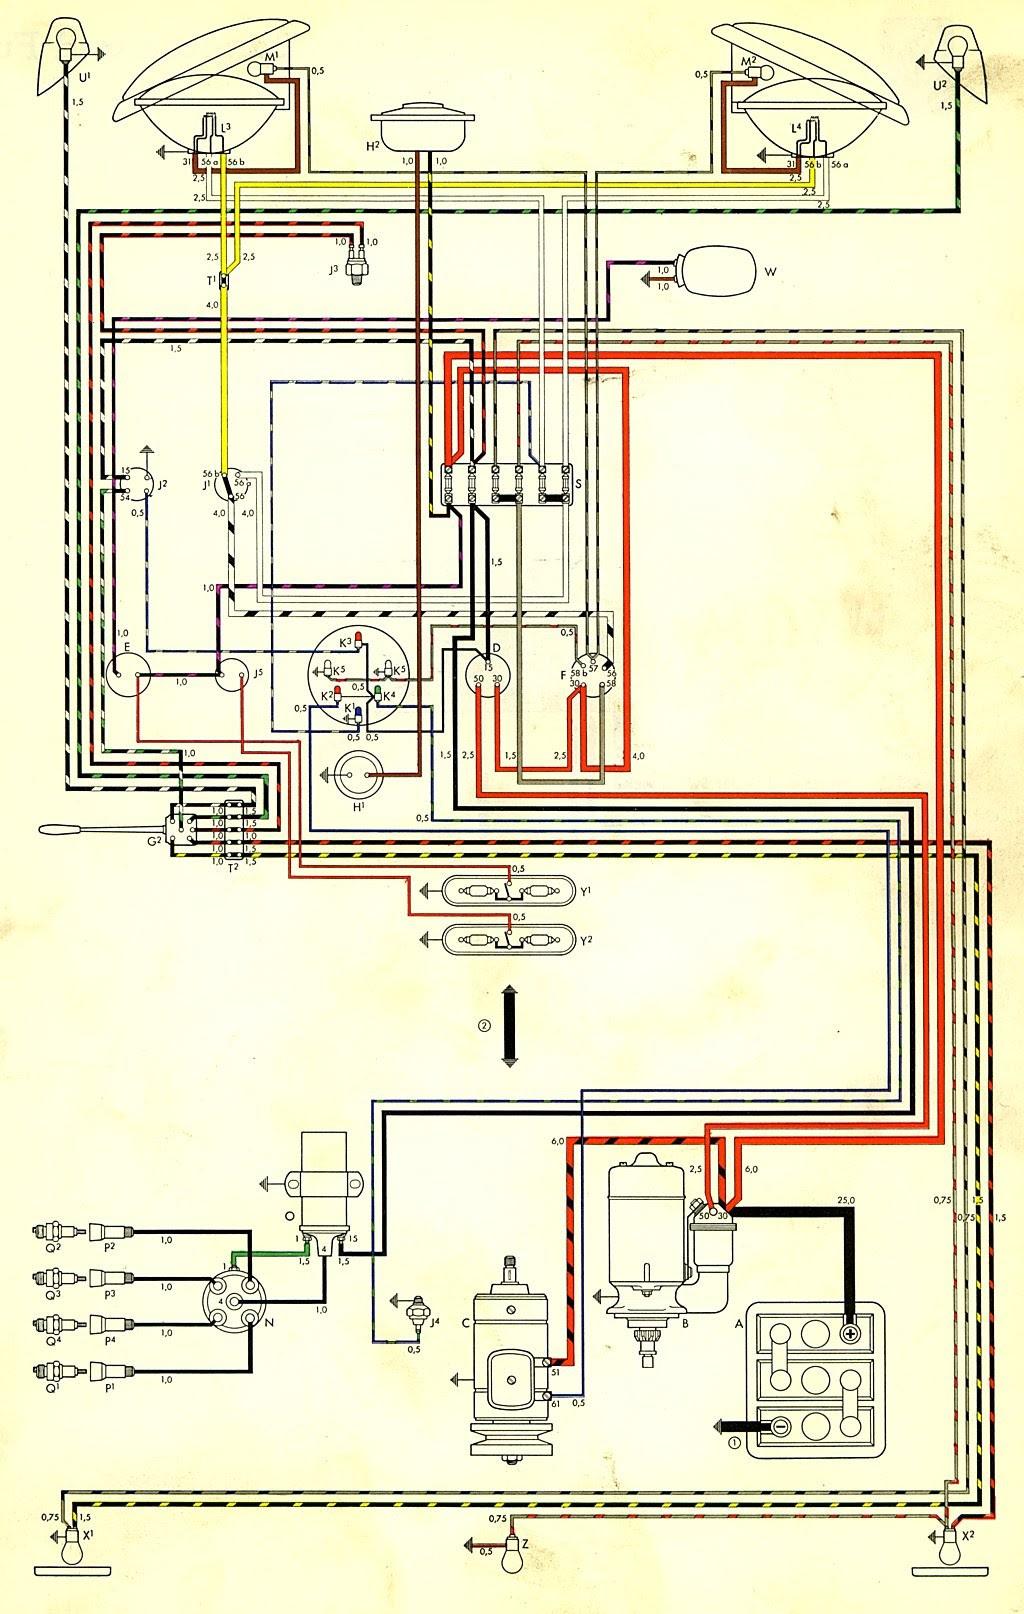 Diagram Vw Beetle Generator Wiring Diagram Thesamba Gallery Full Version Hd Quality Thesamba Gallery Tinydiagrams Creasitionline It